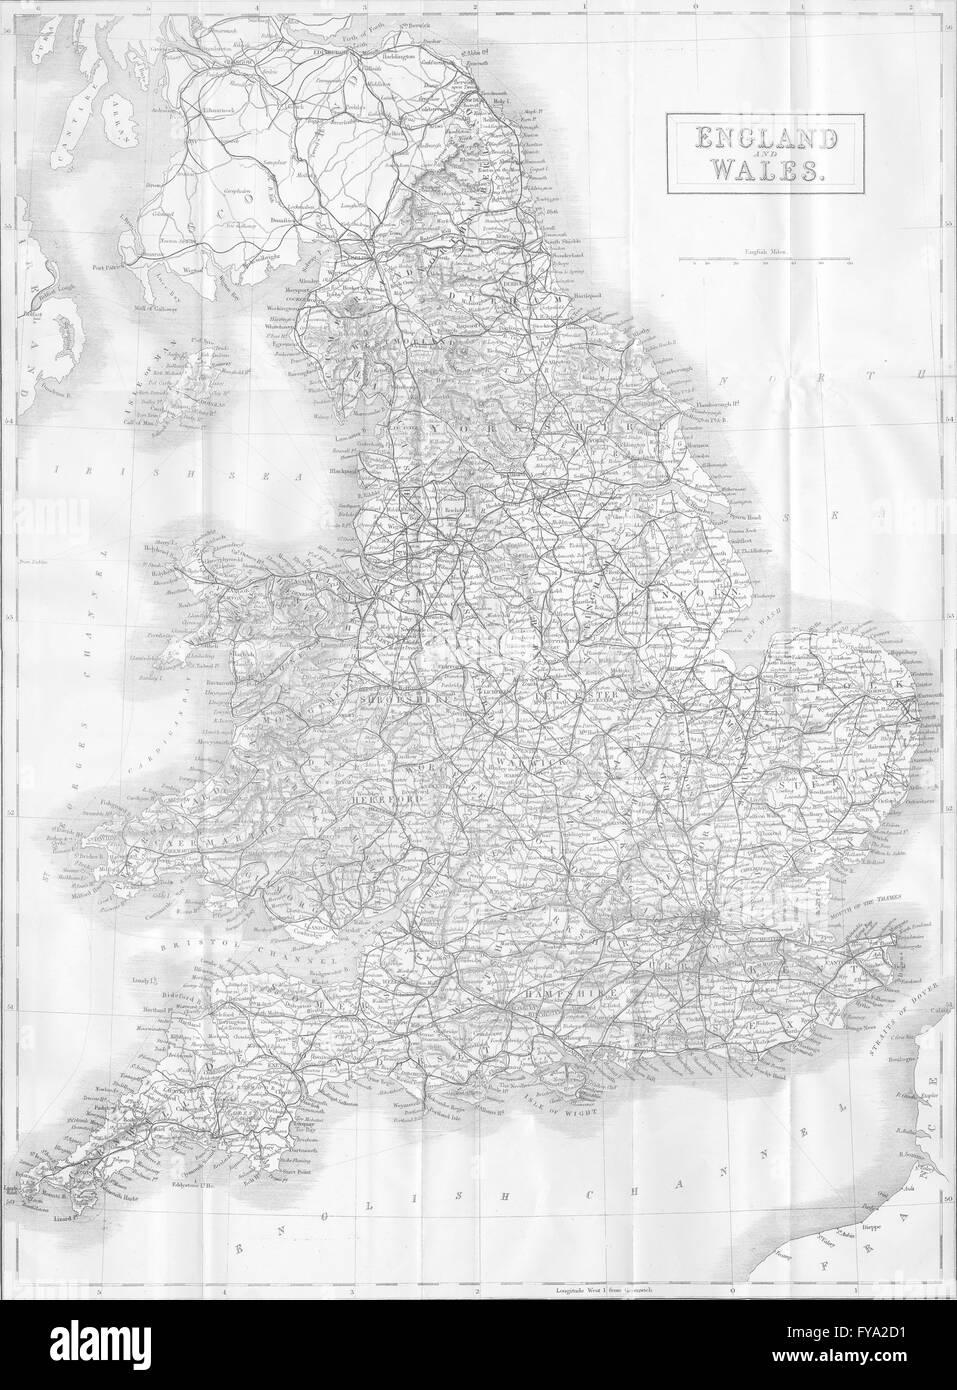 ENGLAND: Map of England, 1874 - Stock Image